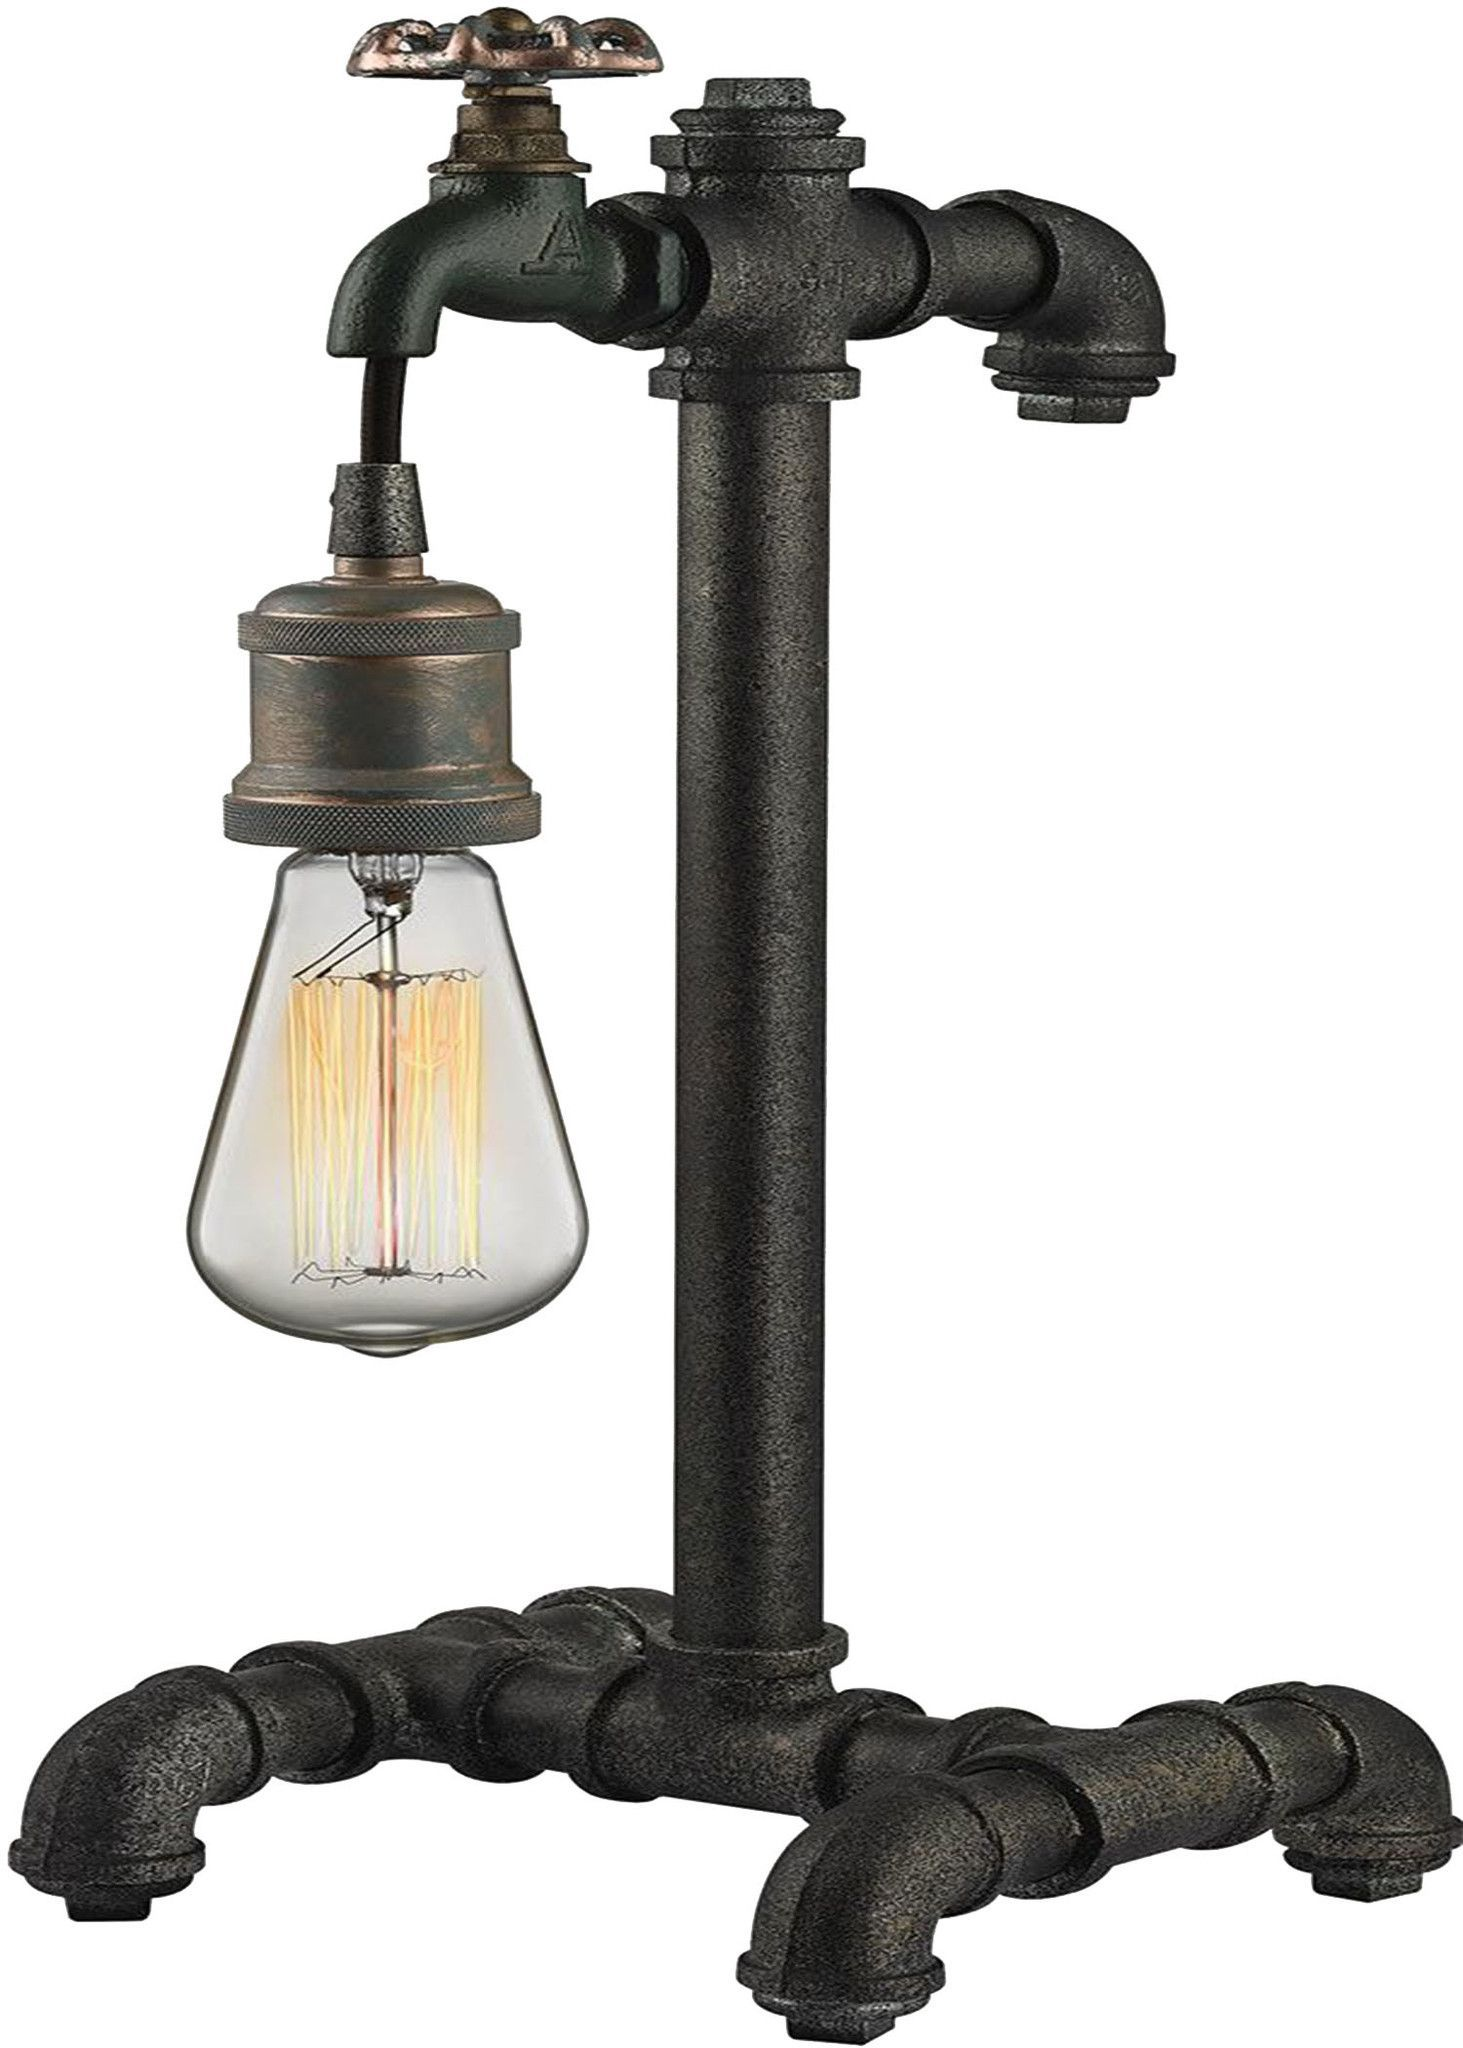 Water Faucet Table Lamp Industrial Design Pinterest